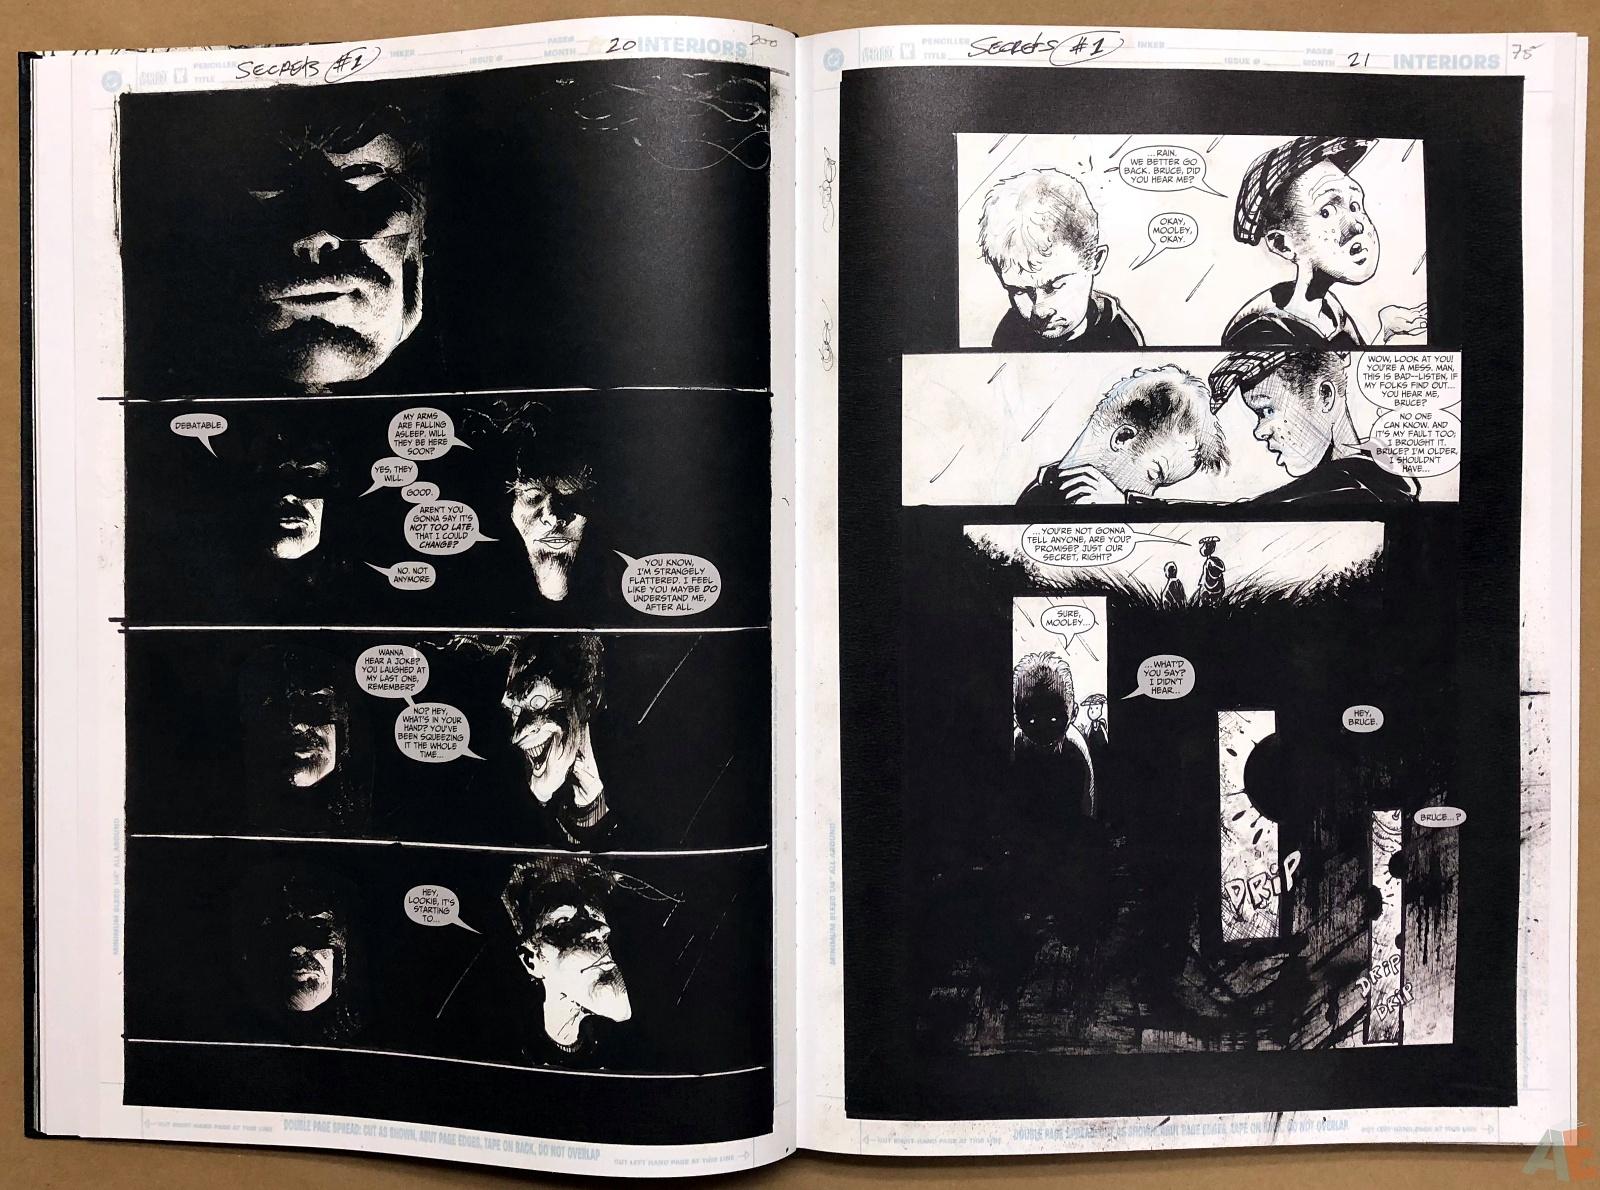 Batman: Secrets – Sam Kieth Gallery Edition 13